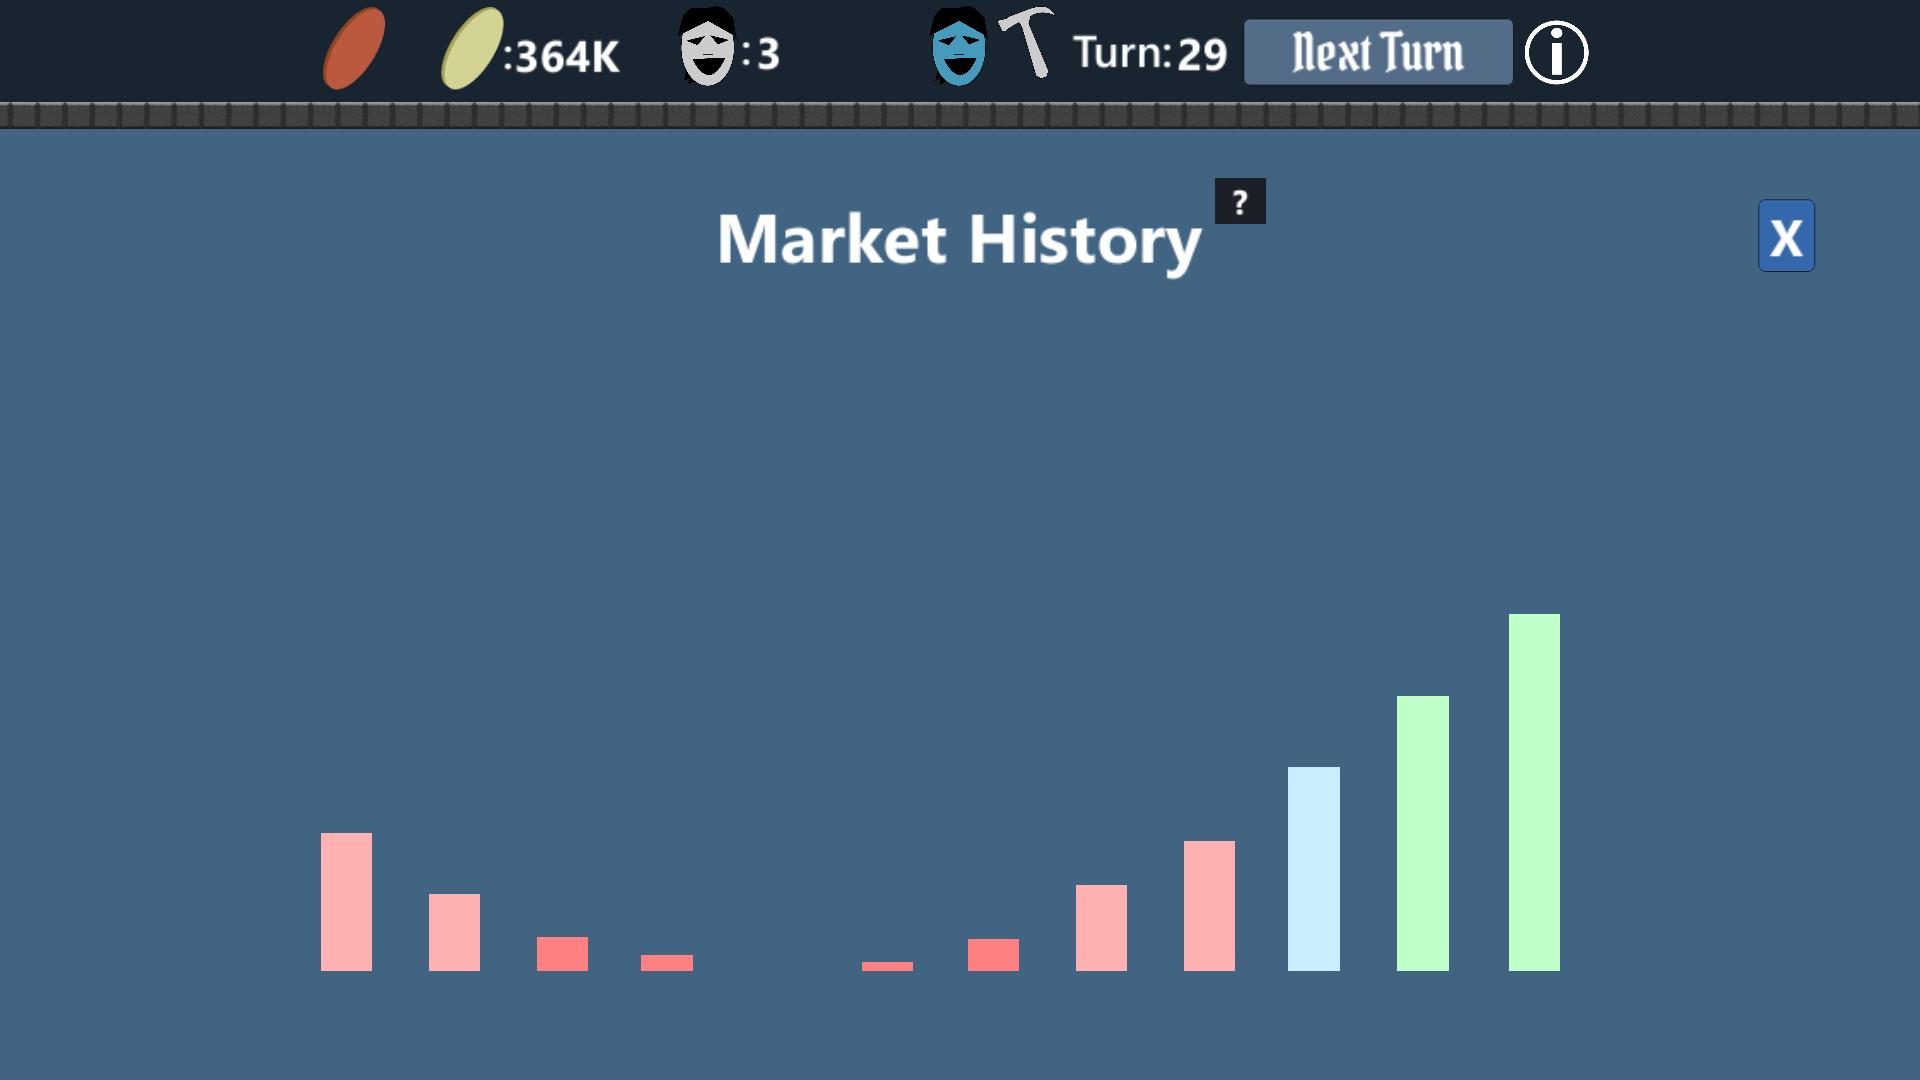 Kalling Kingdom - Market History Panel